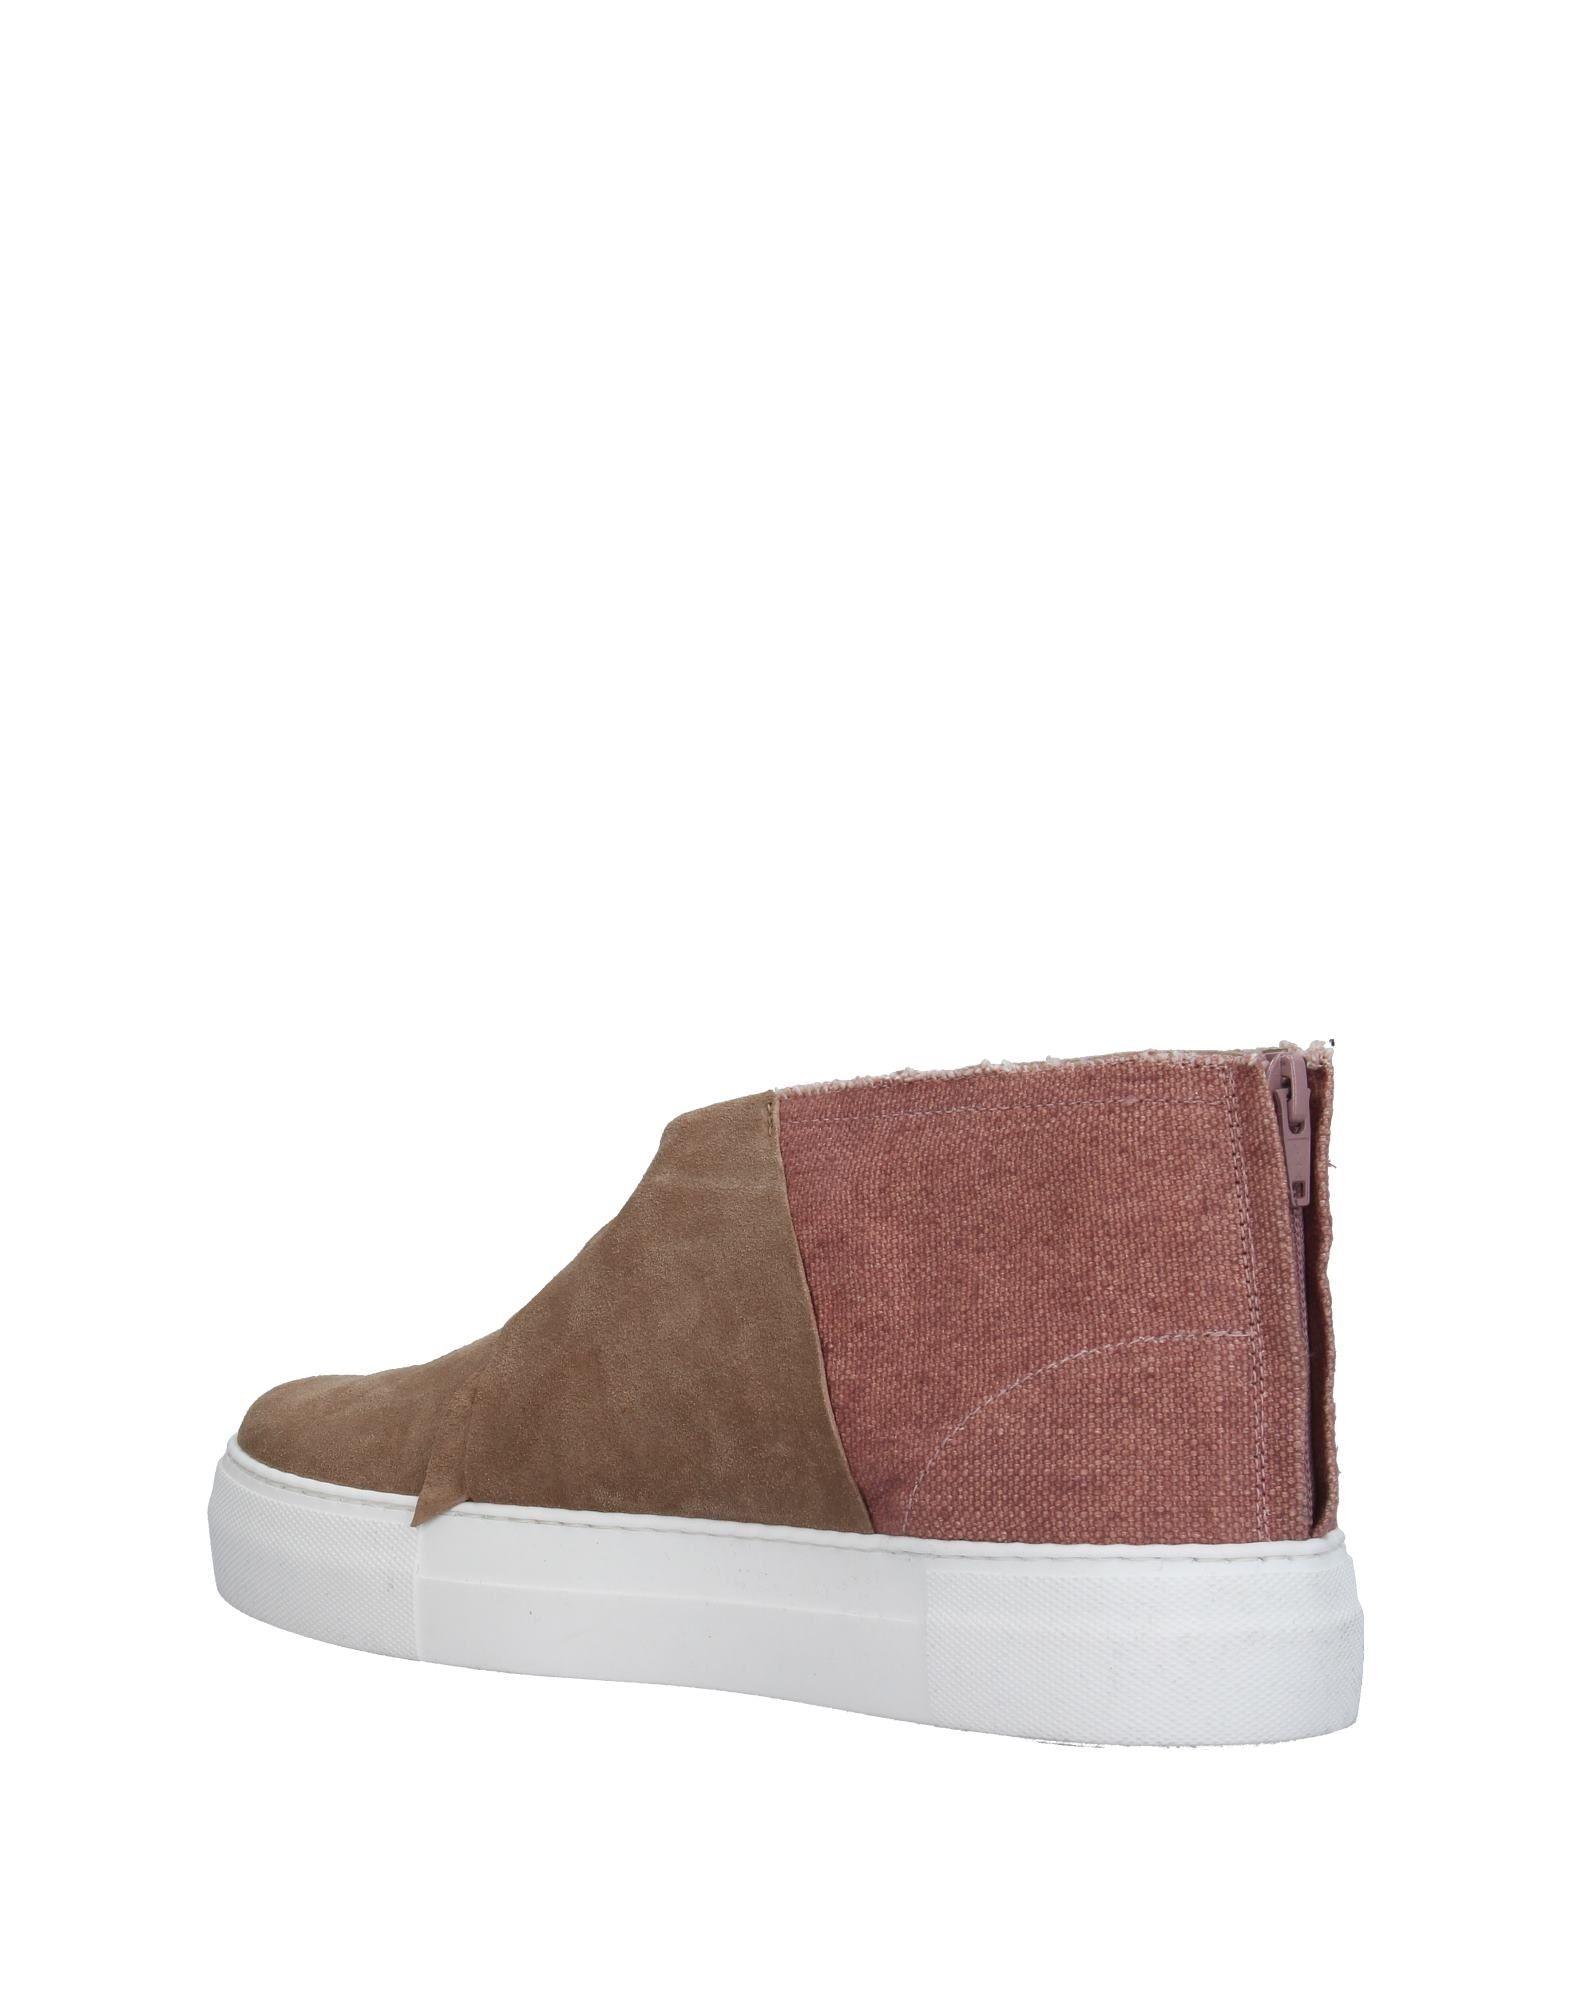 Ports 1961 Sneakers Damen  11283647RN Neue Schuhe Schuhe Neue 839f5d